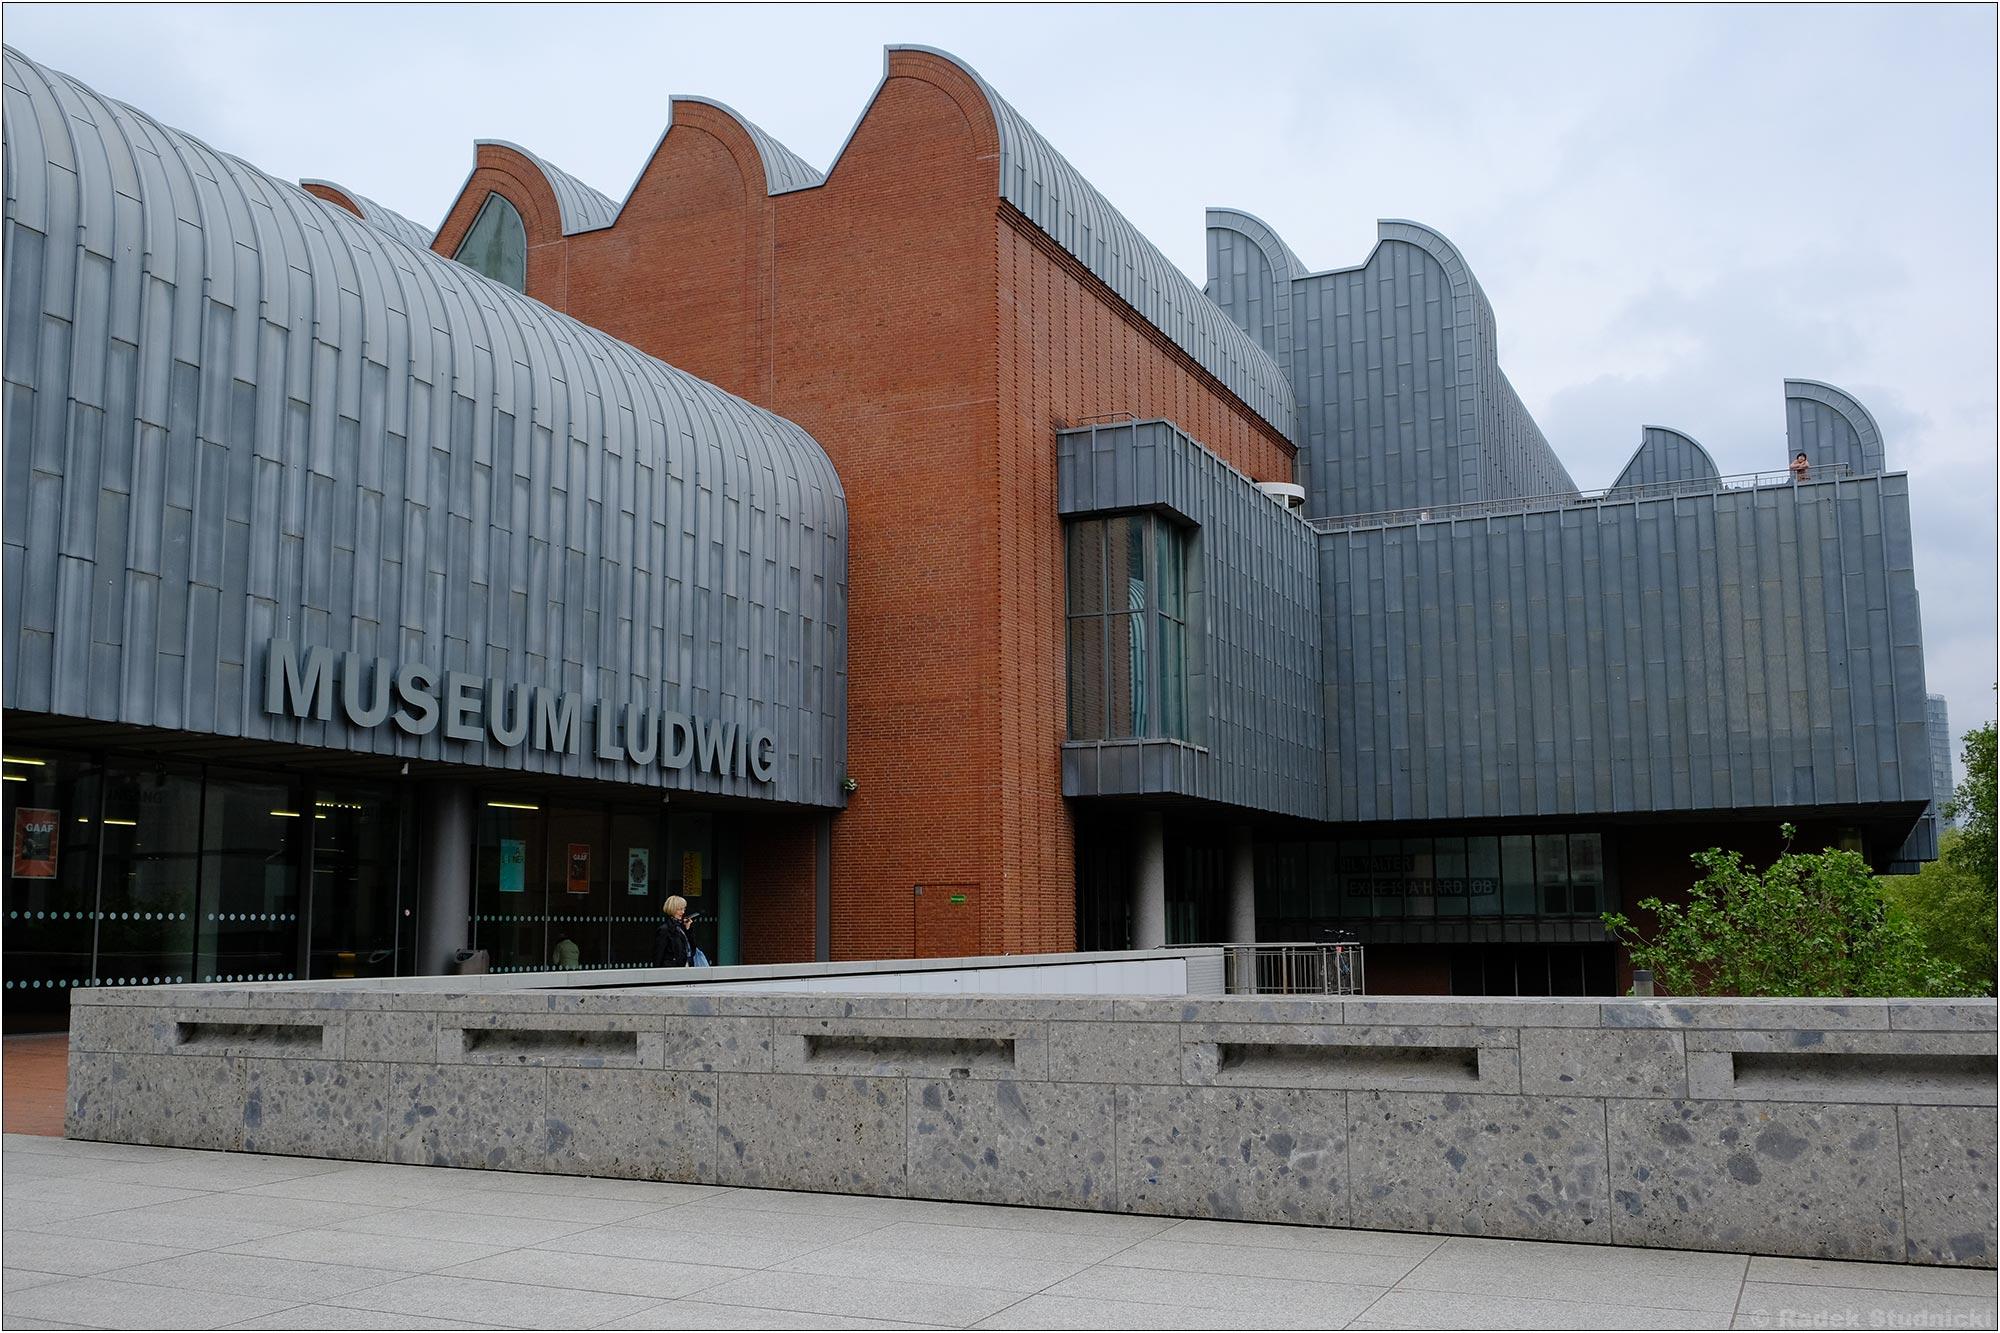 Muzeum Ludwig